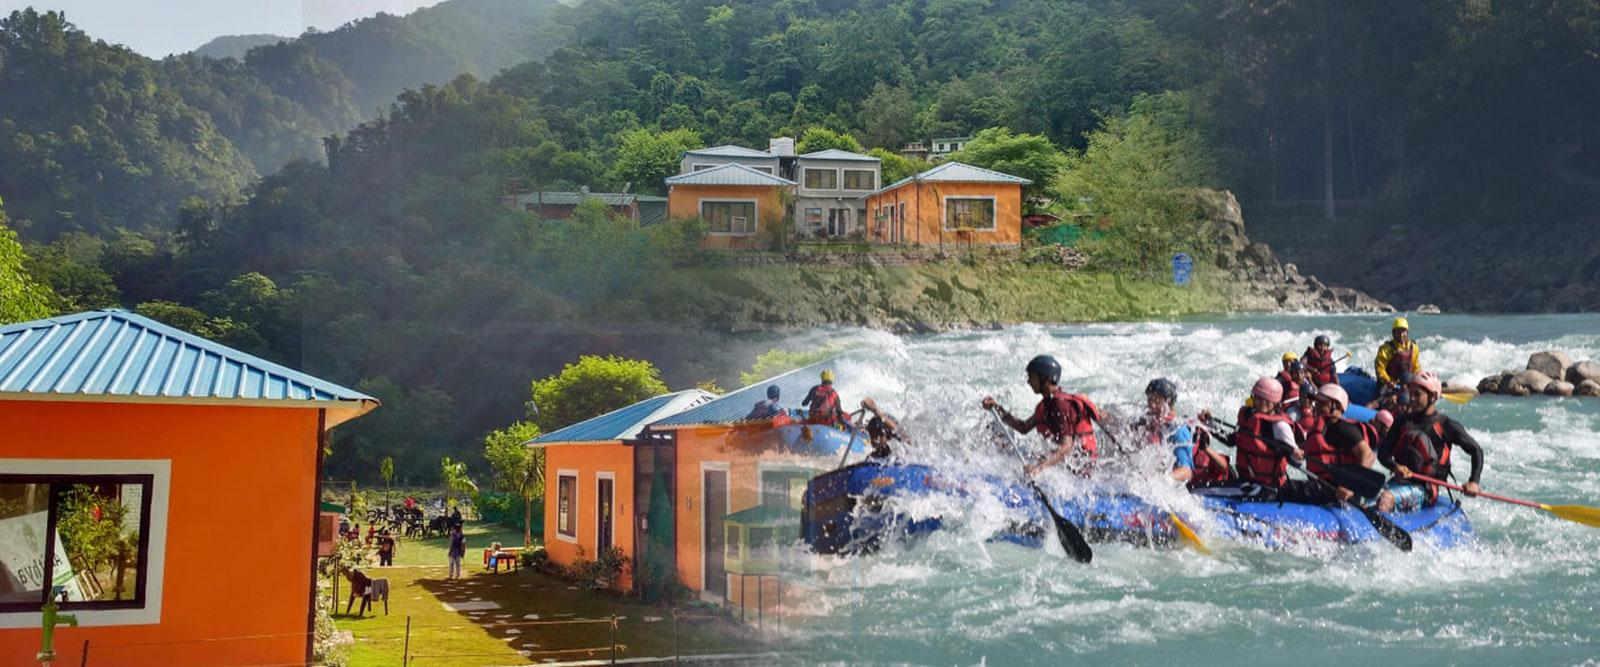 rafting-camping-in-rishikesh